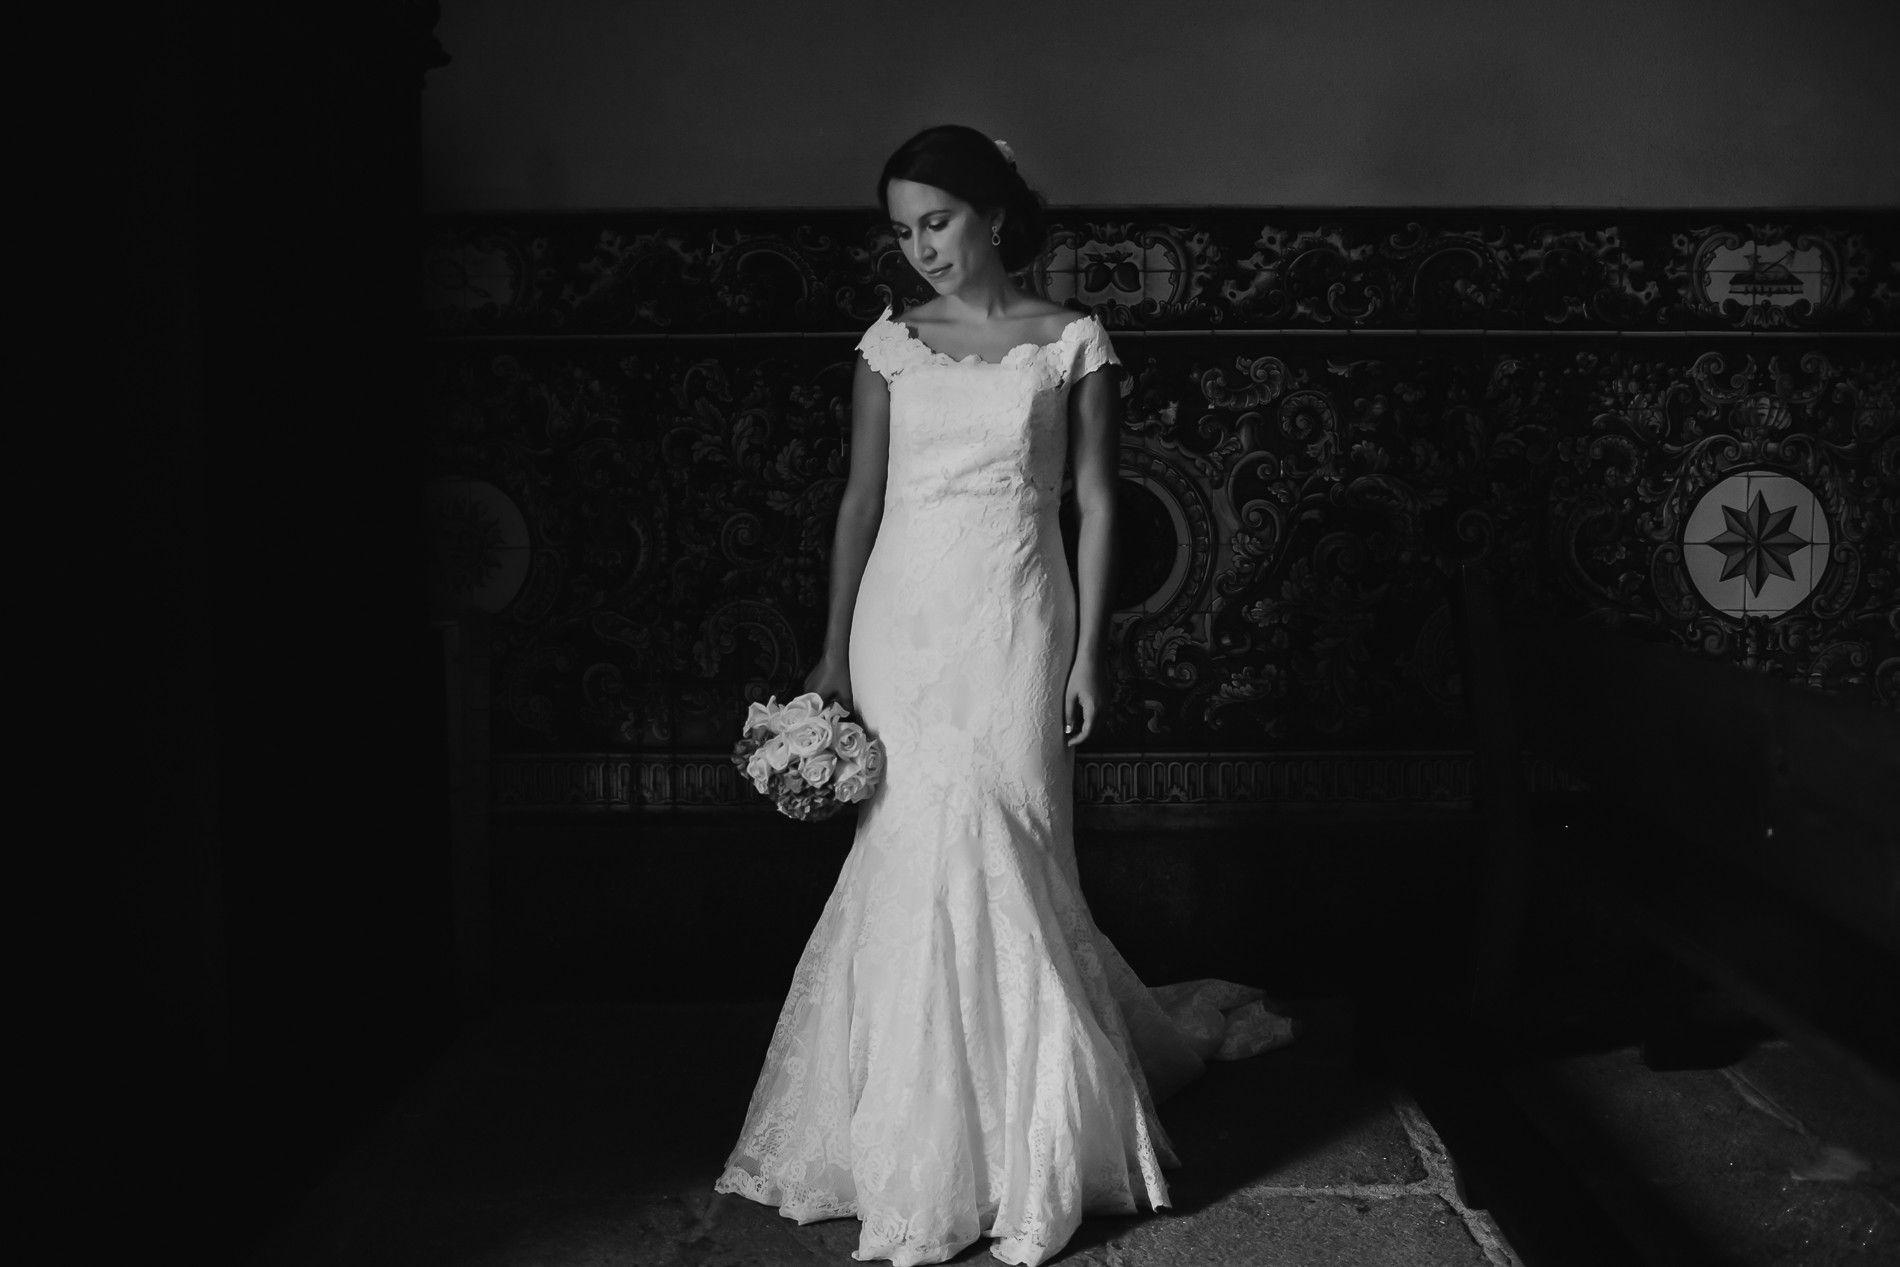 fotografo-de-boda-plasencia-28